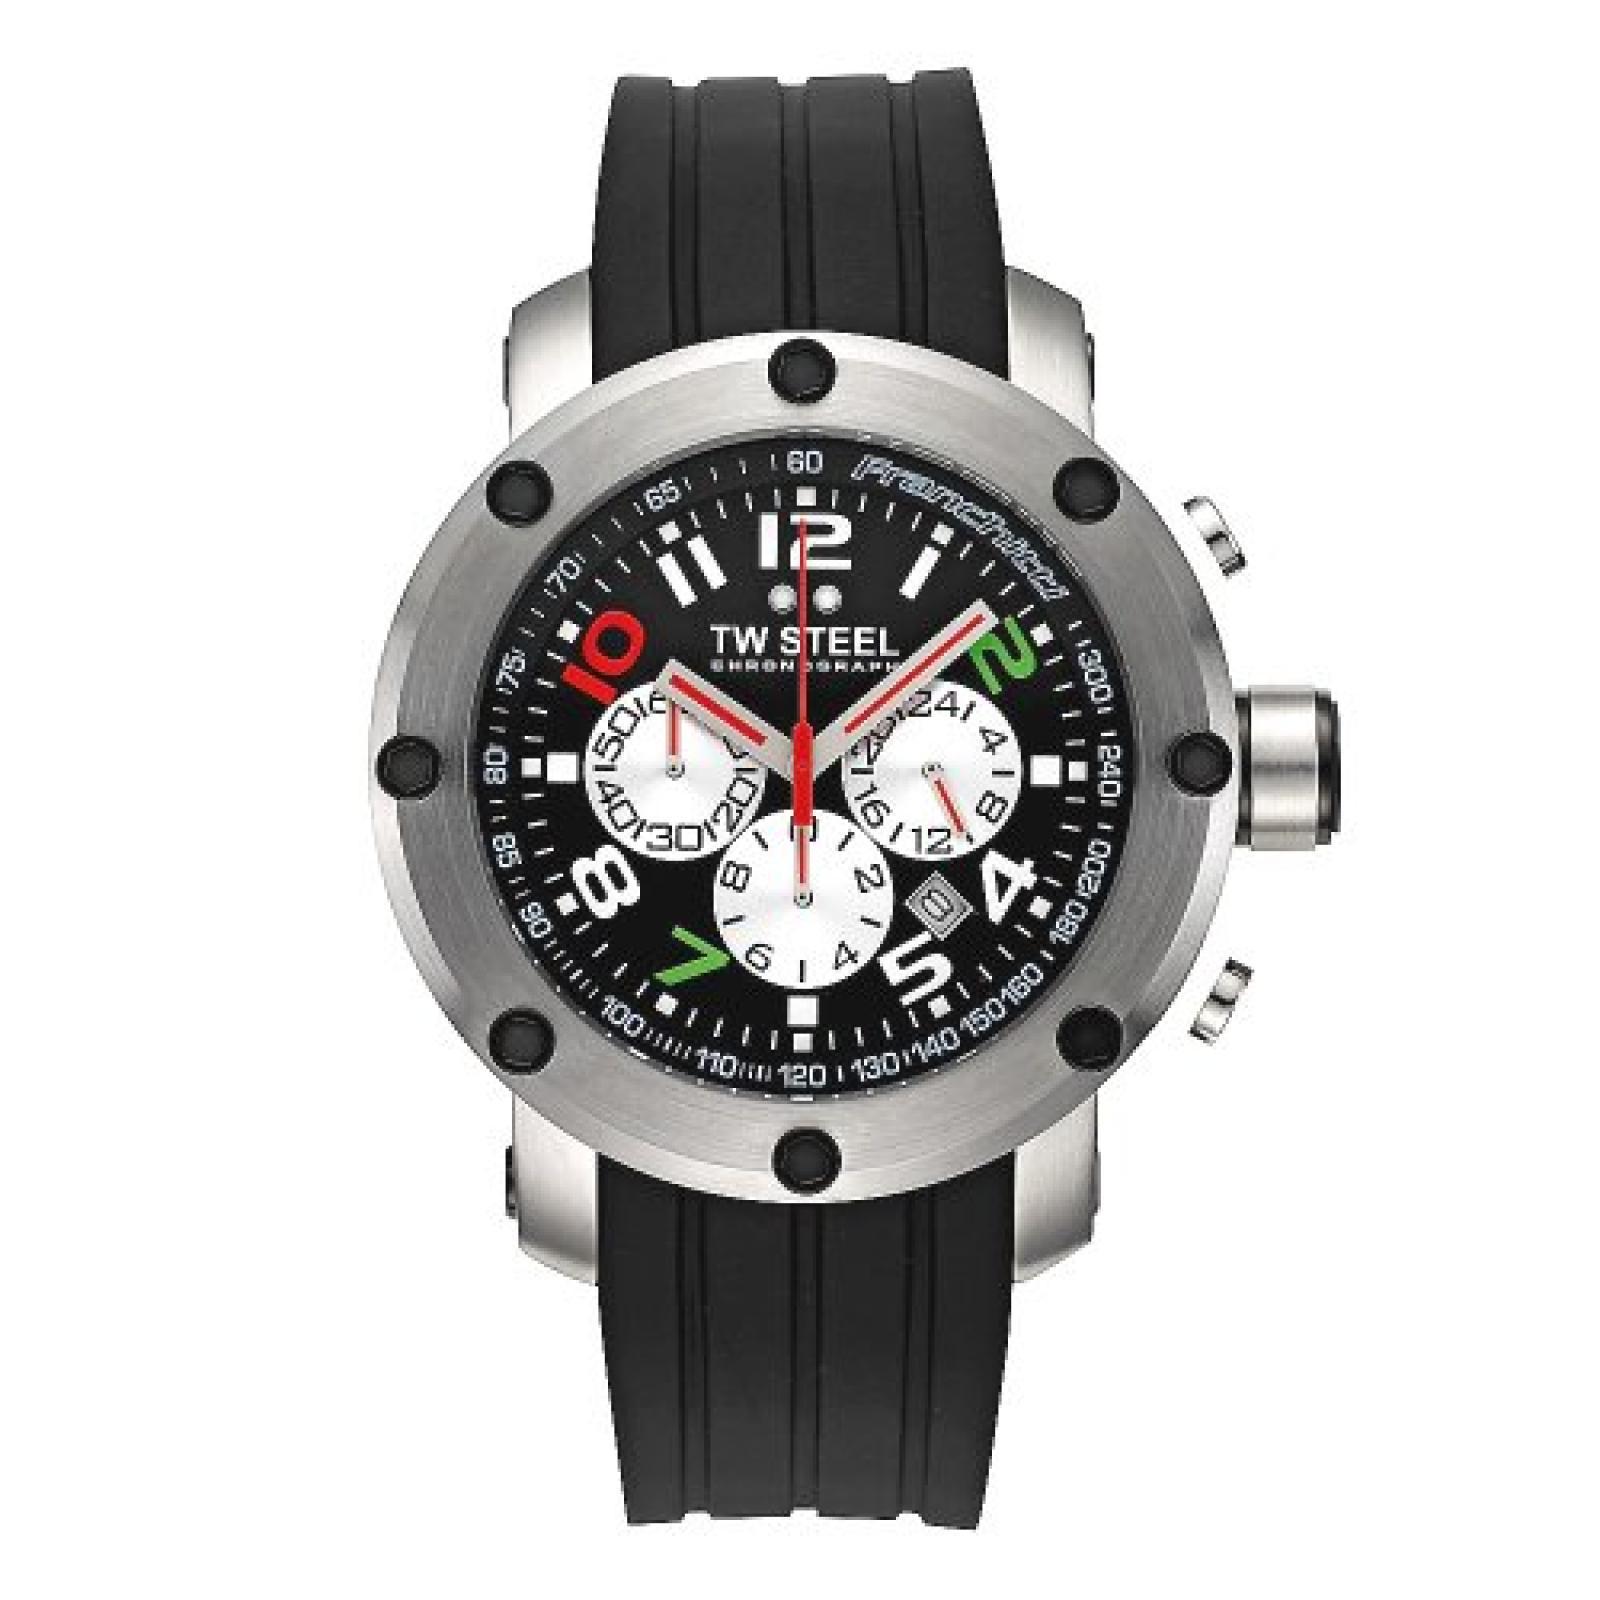 TW Steel Sonder-Edition Herren-Armbanduhr XL Grandeur Tech Chronograph Silikon TW-608